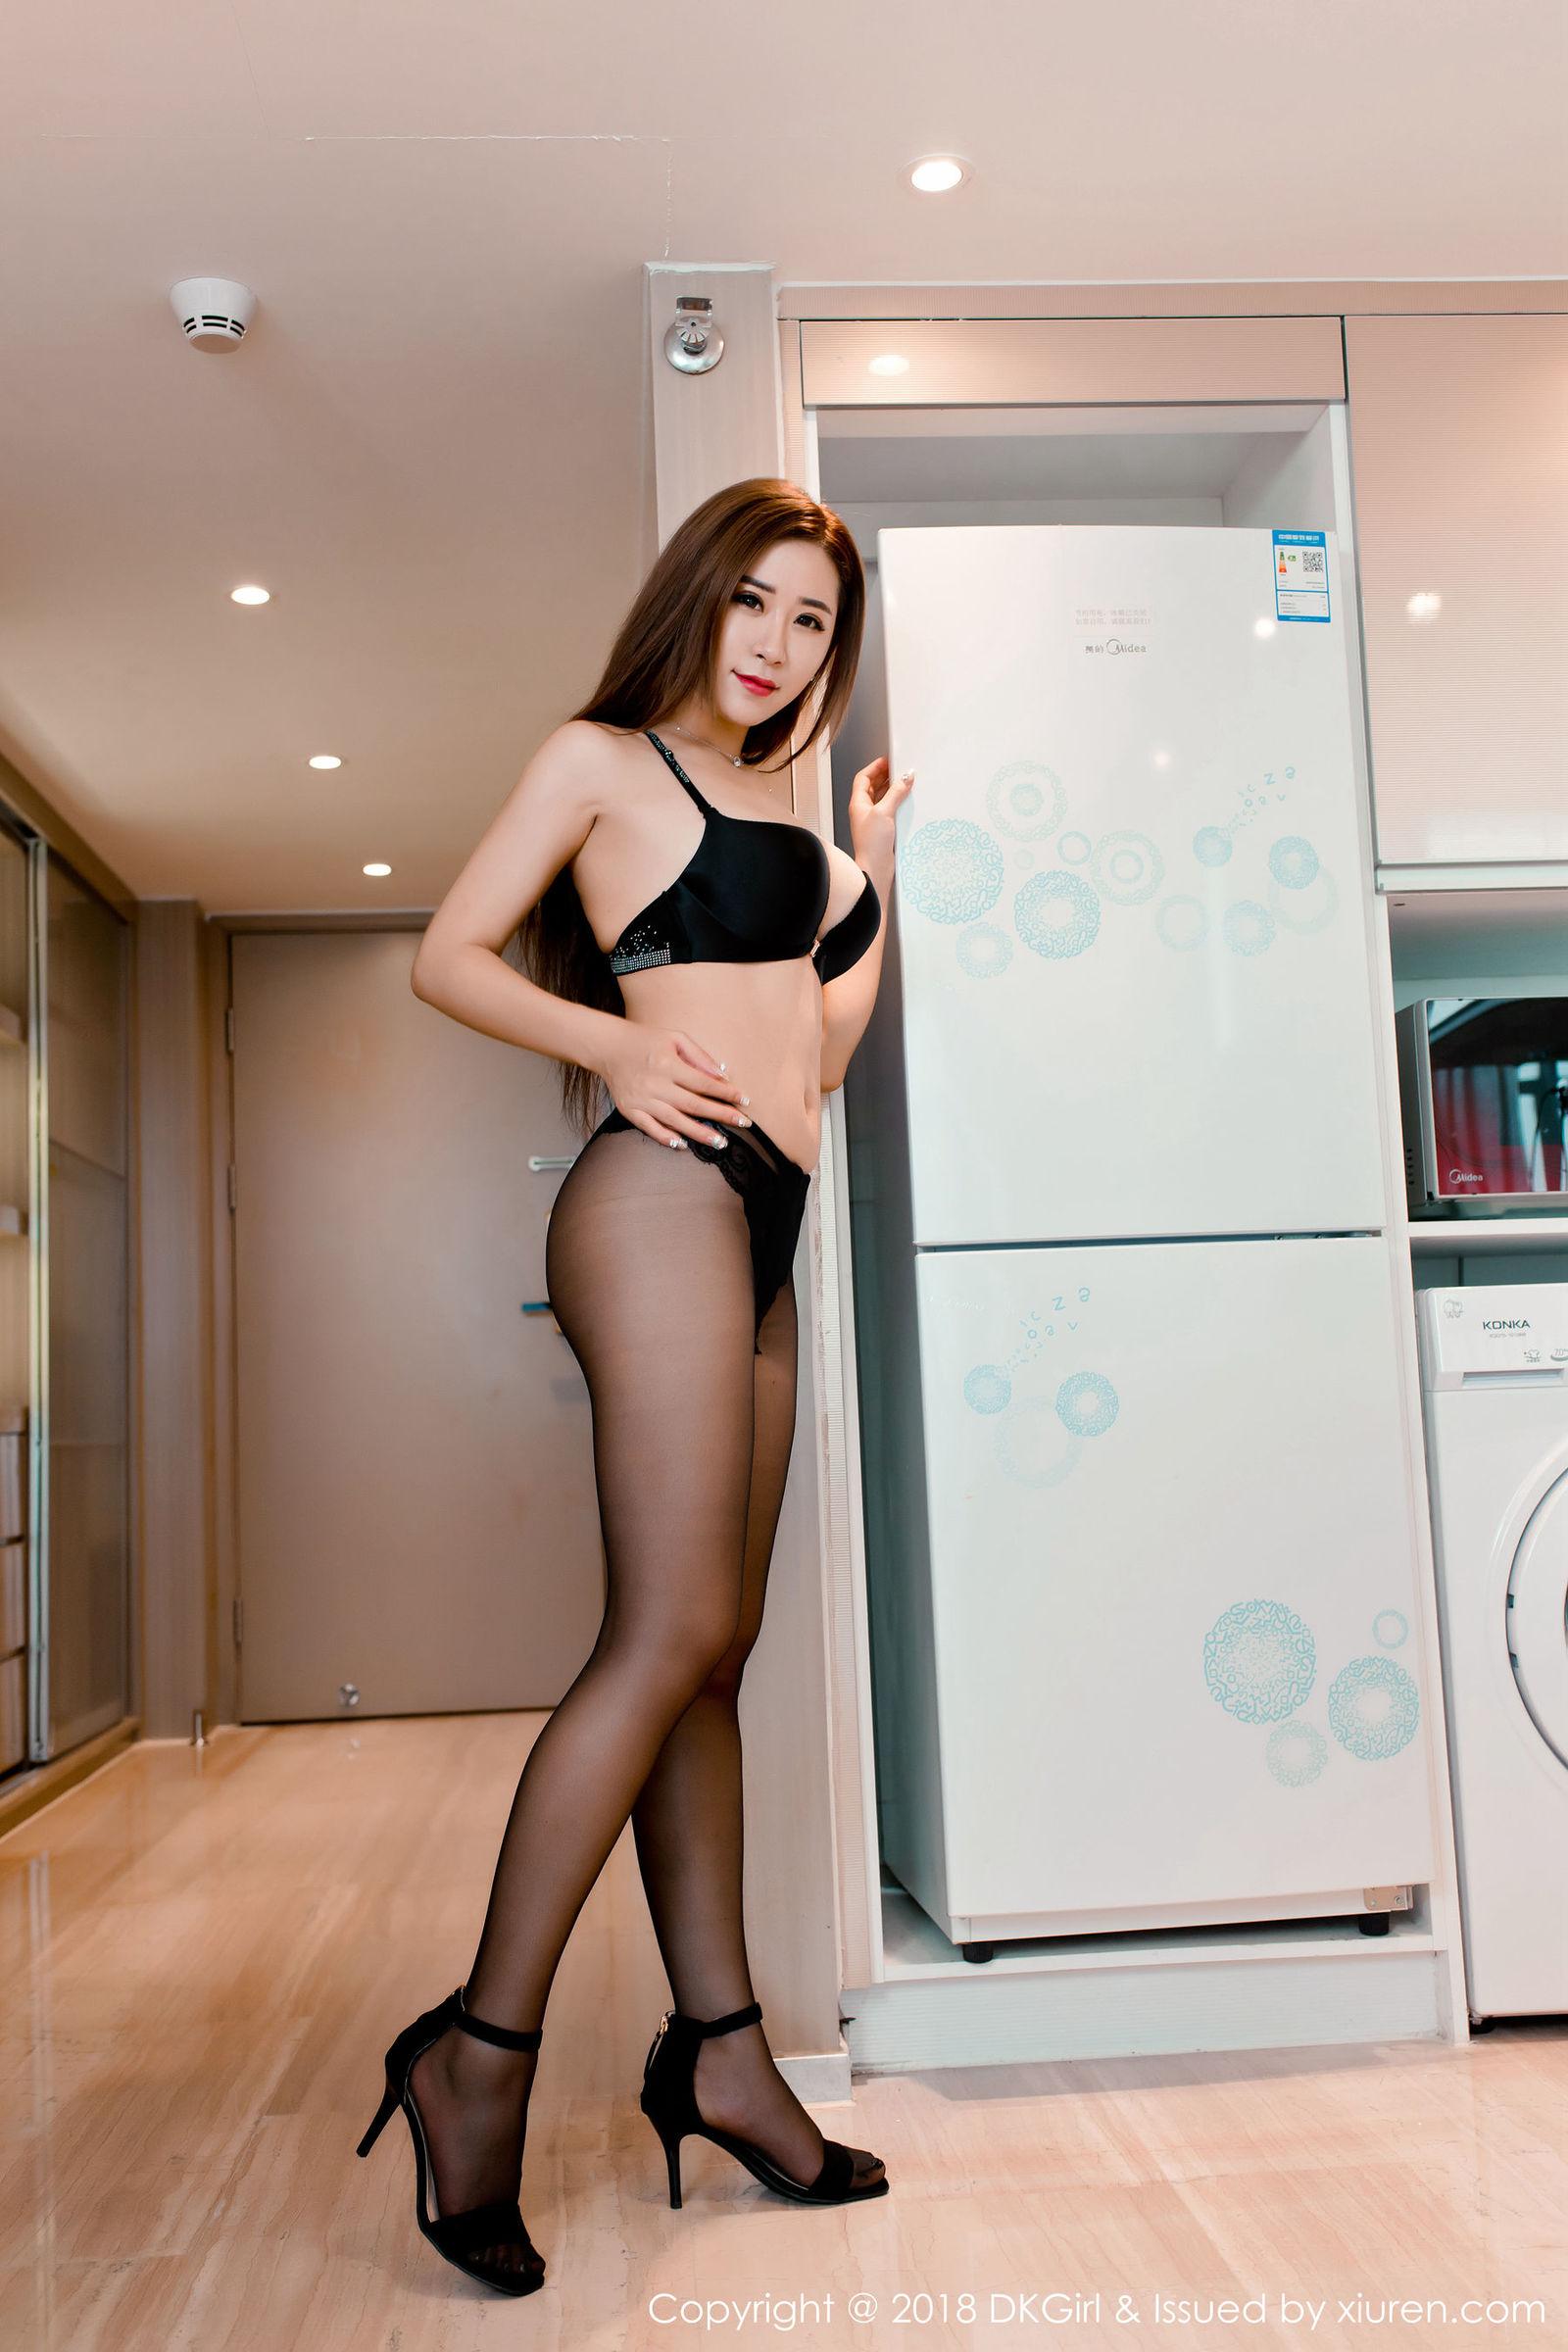 [DKGirl御女郎] Vol.086 新人模特@雪儿Cier首套写真